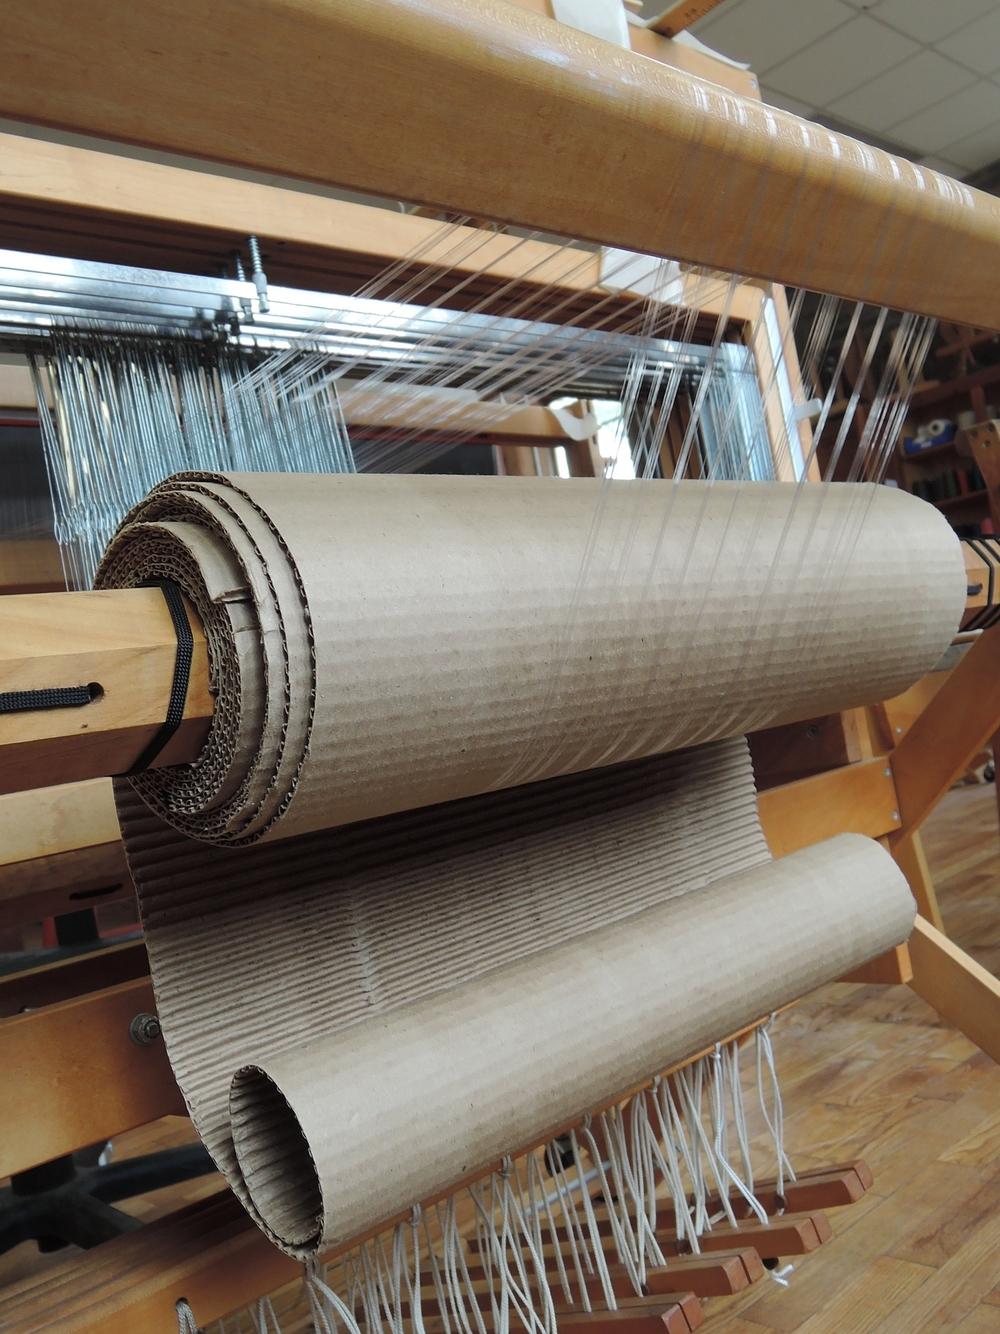 Warp on the loom.